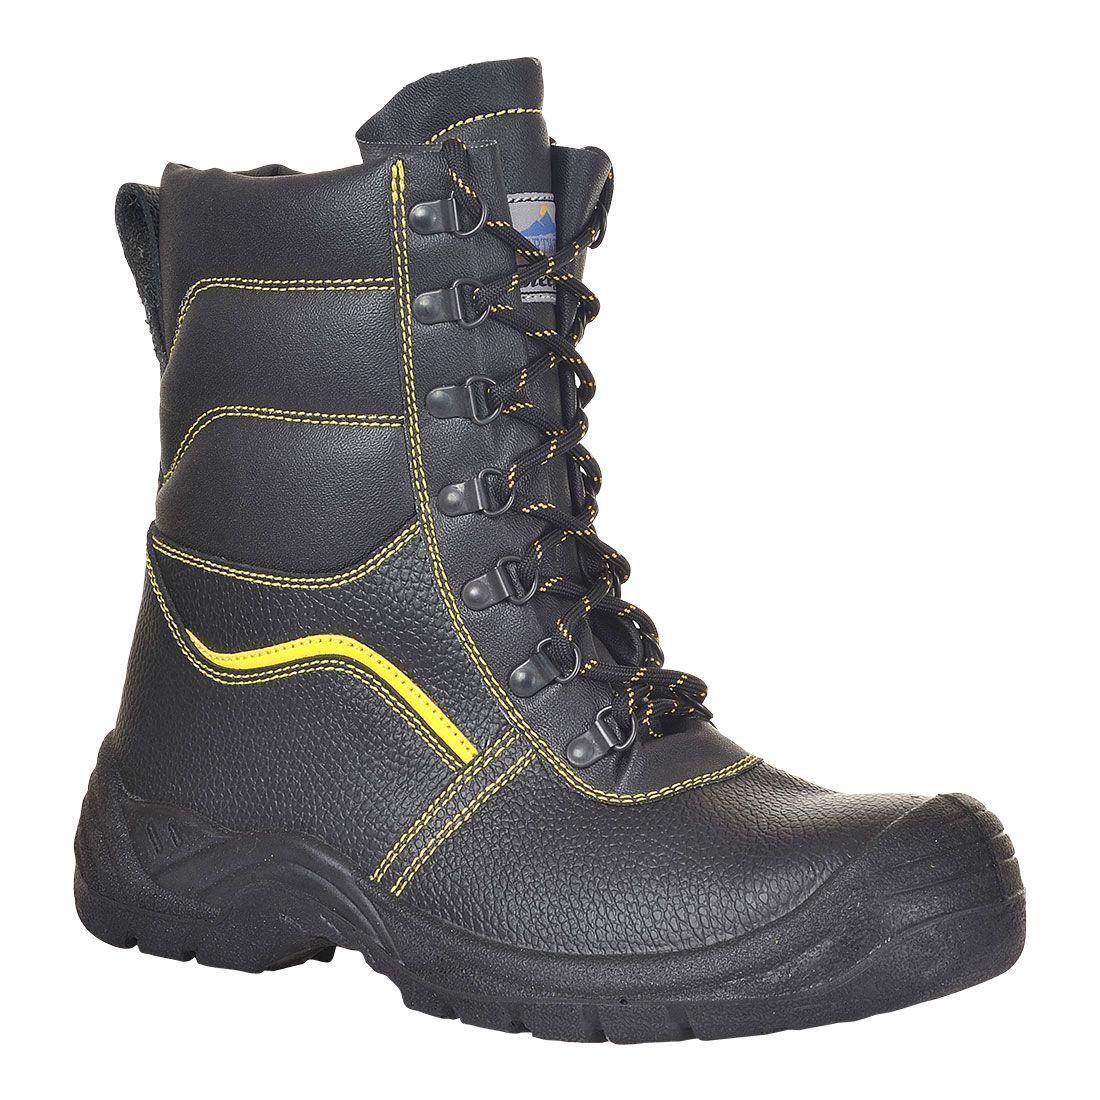 Portwest Schoenen FW05 zwart(BK)